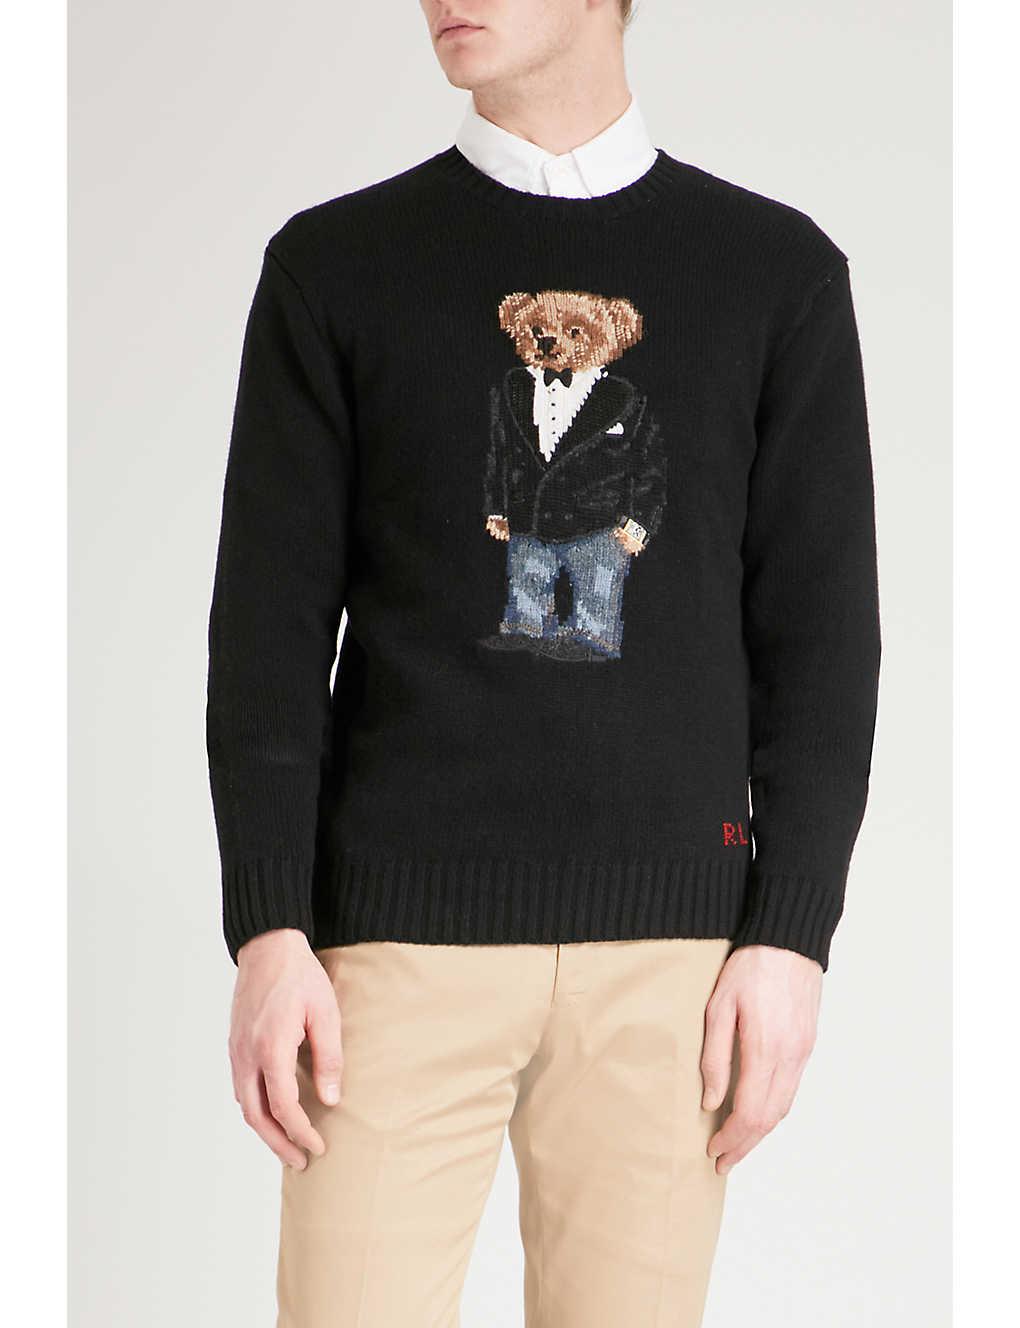 cc89c857a4 POLO RALPH LAUREN - Bear-embroidered wool